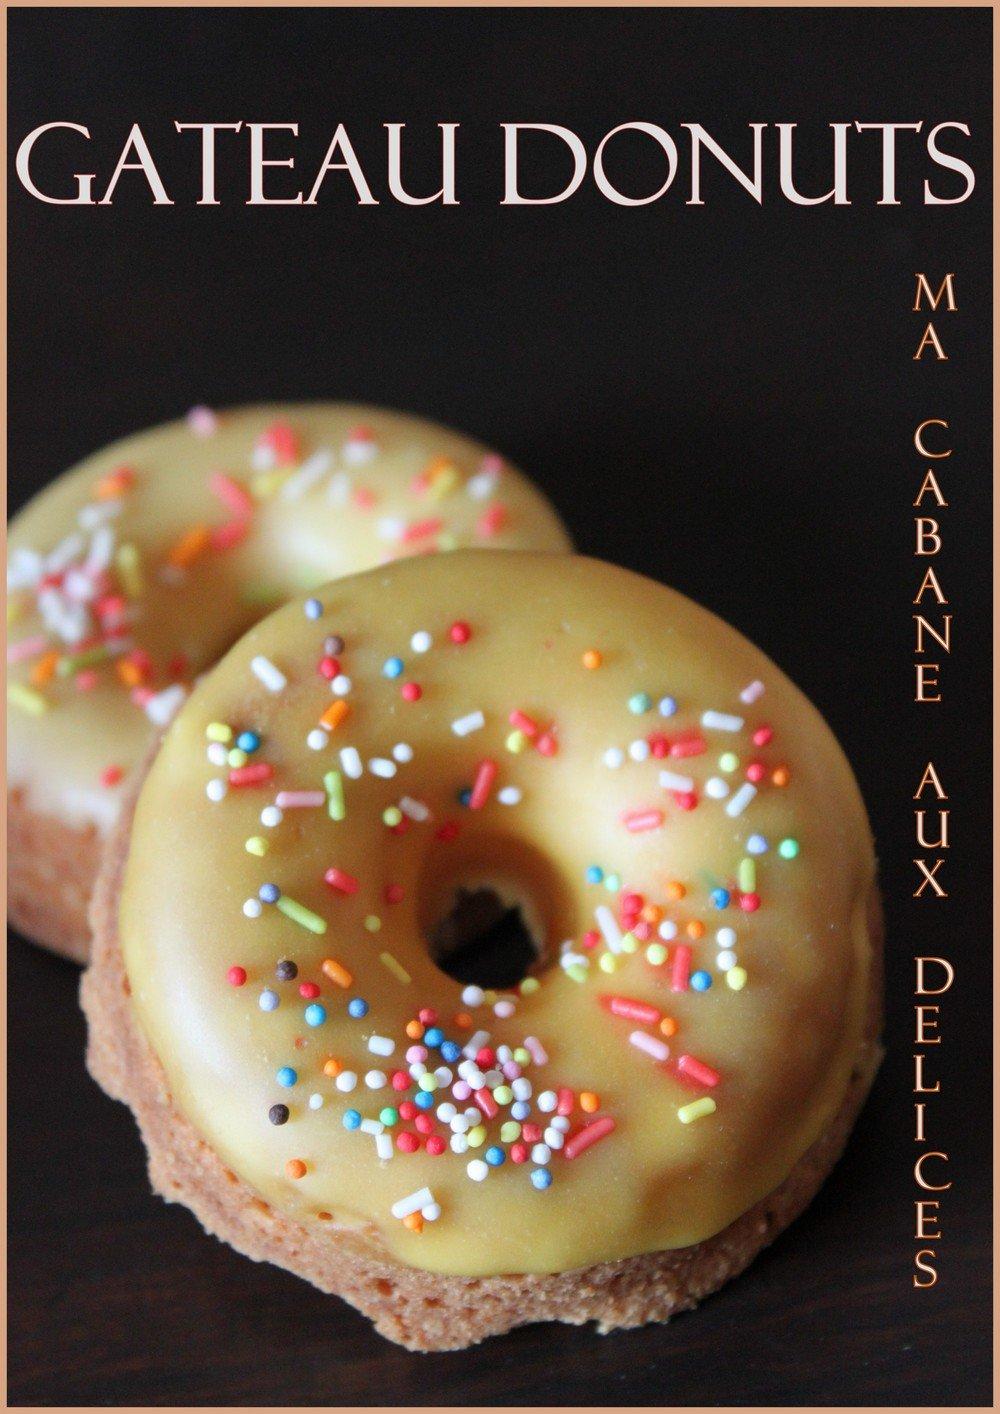 Gateau donuts au four